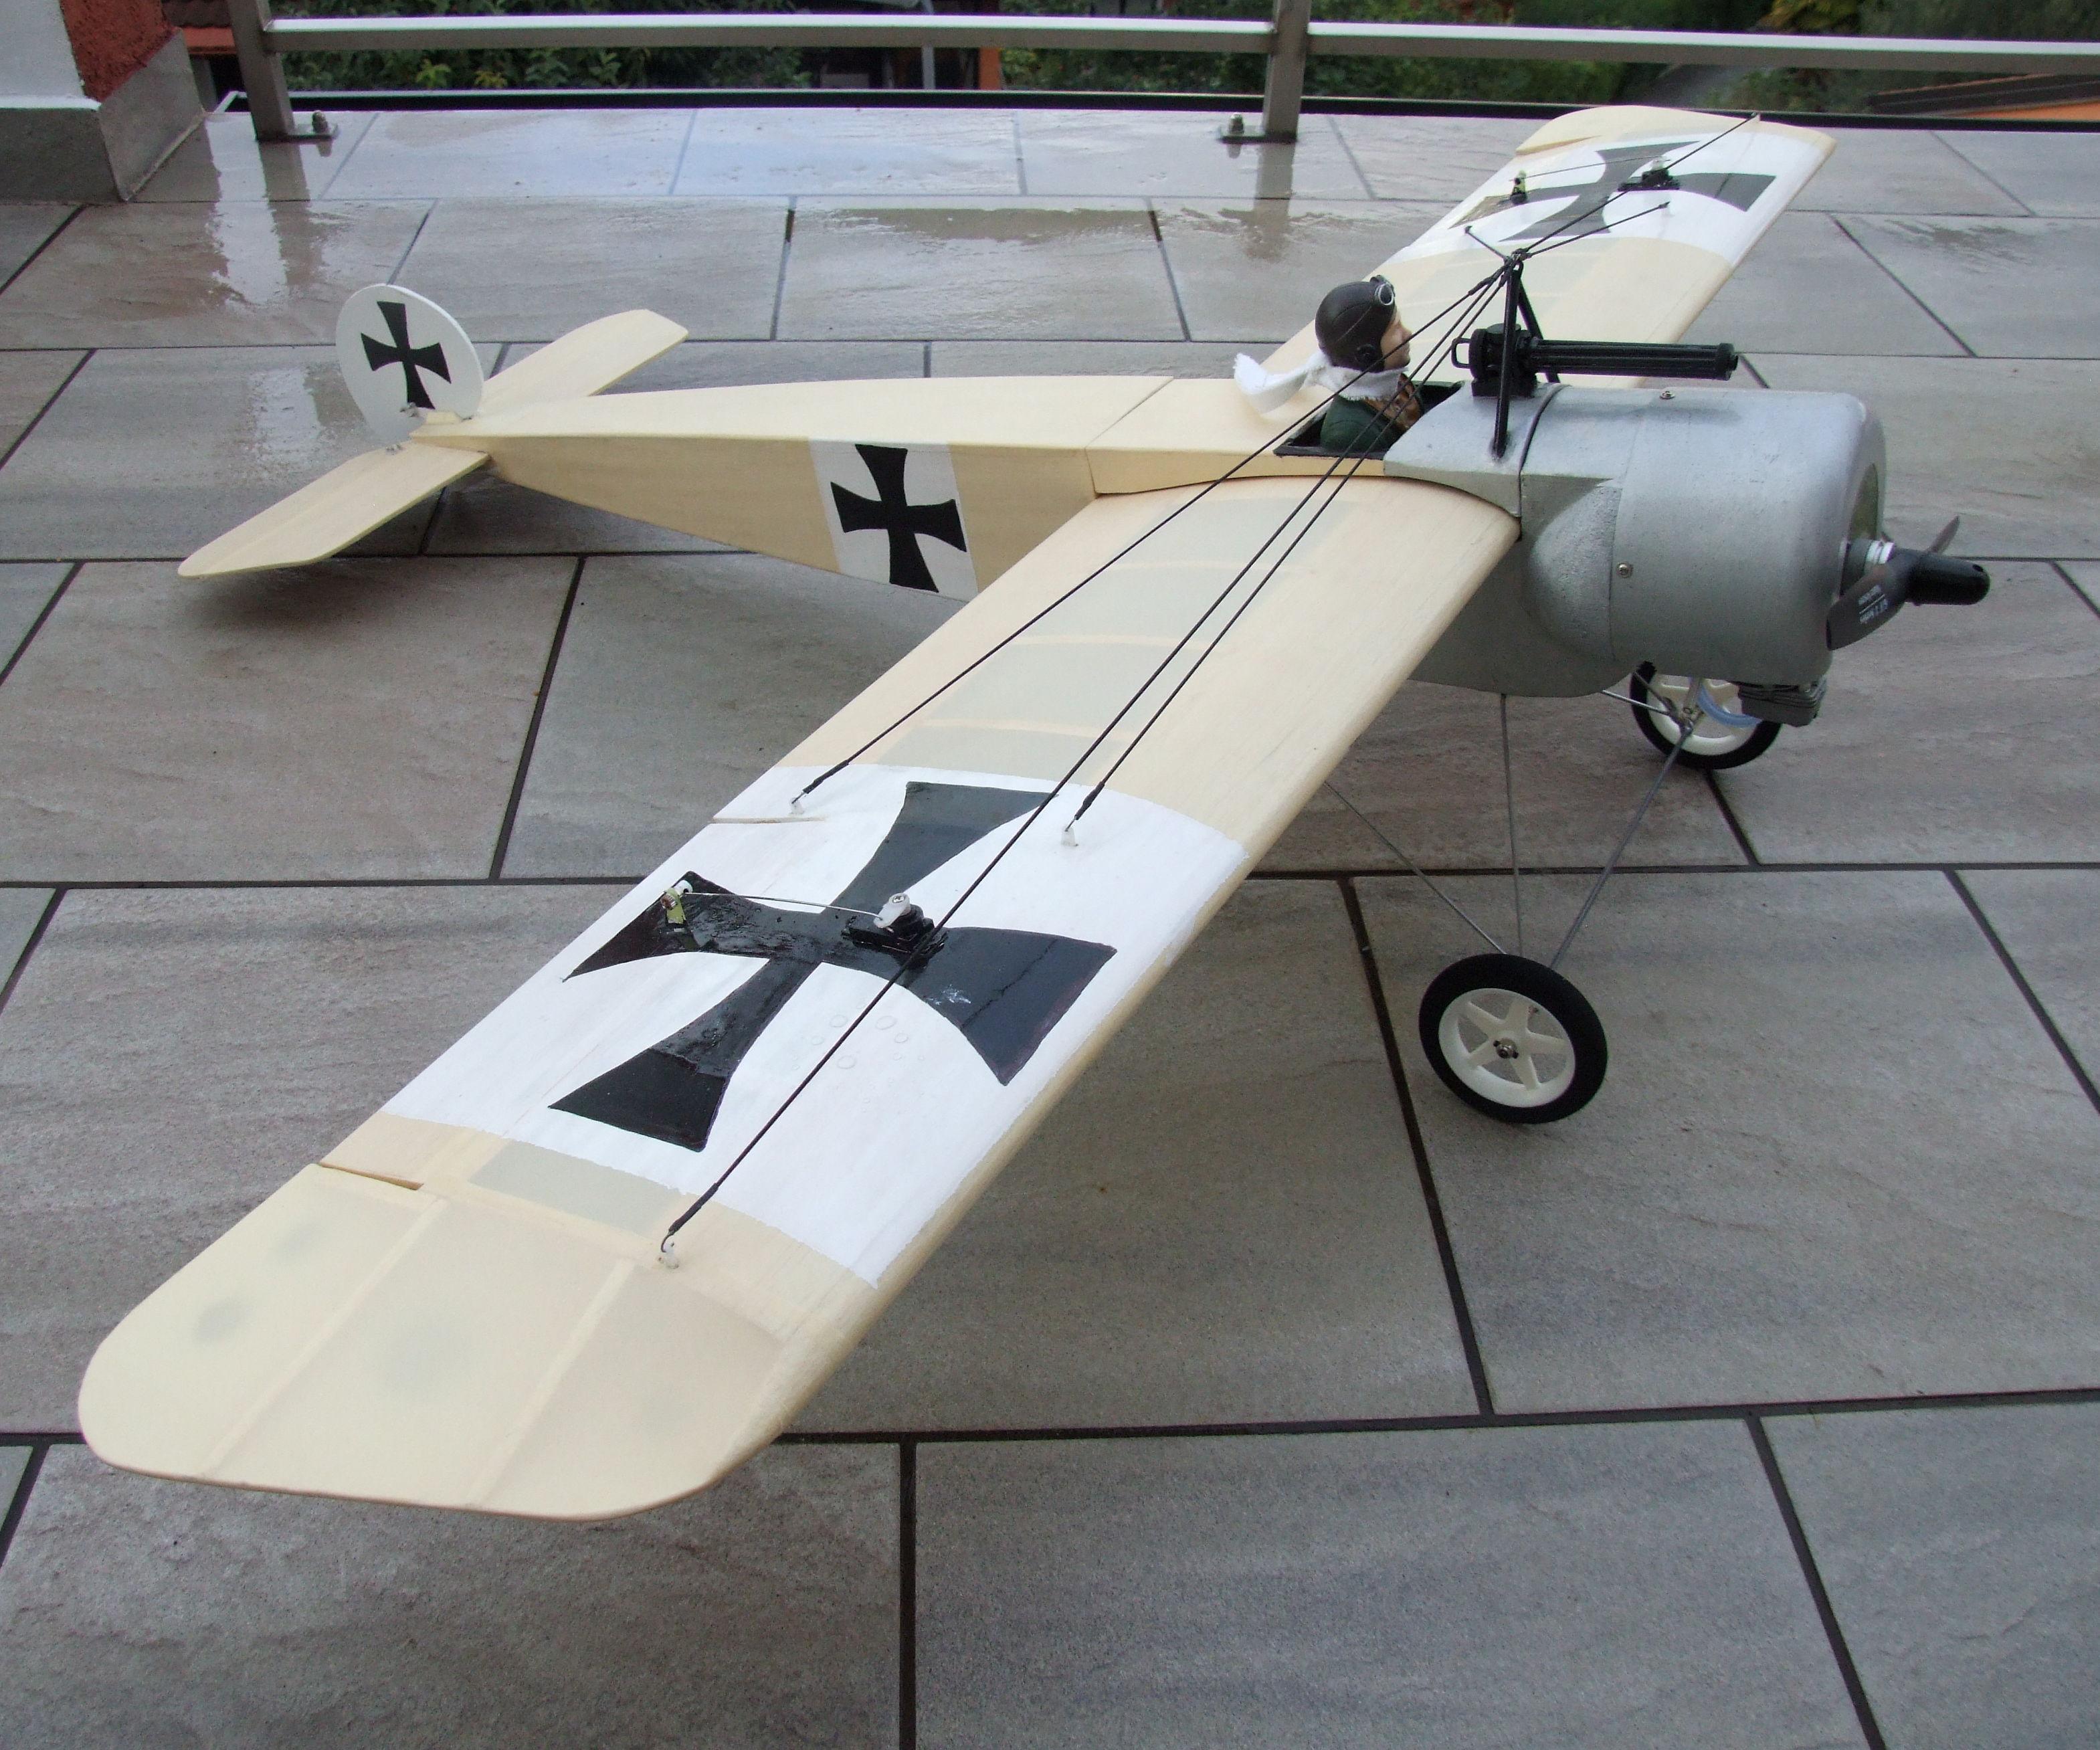 Fokker E.III 1:8 for Aircombat